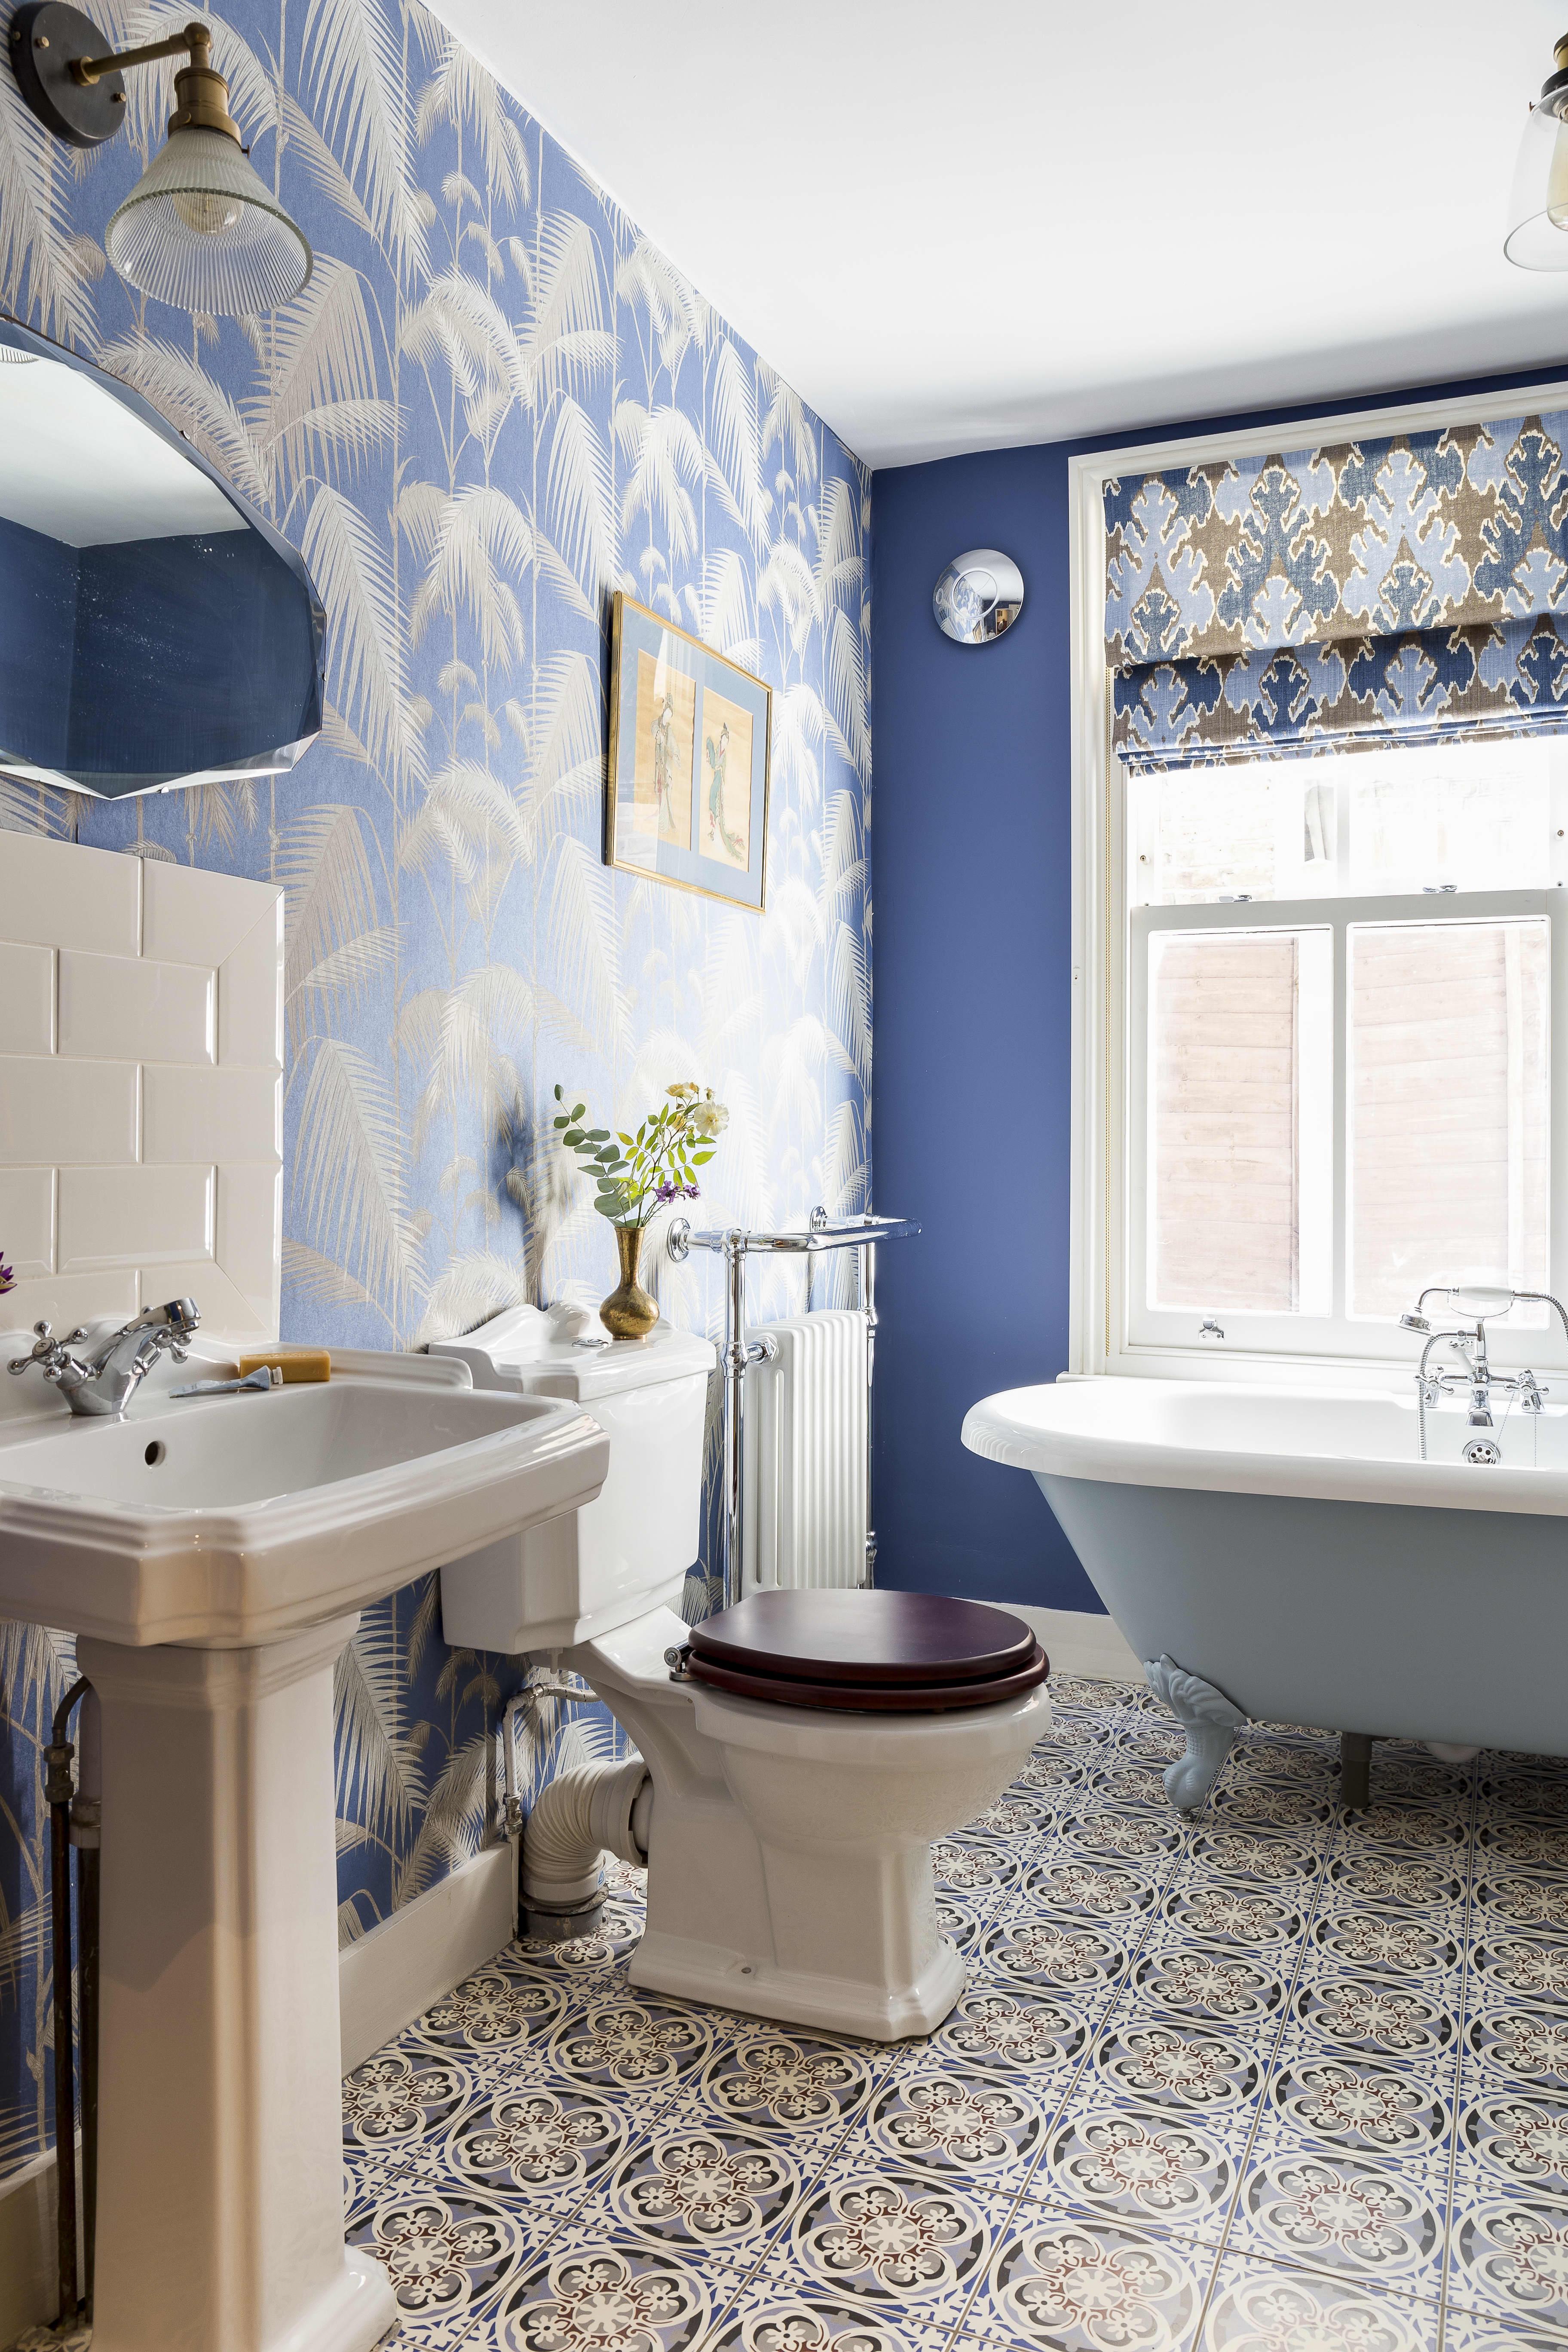 50 Best Bathroom Design Ideas   Apartment Therapy on Apartment Bathroom Ideas  id=47961